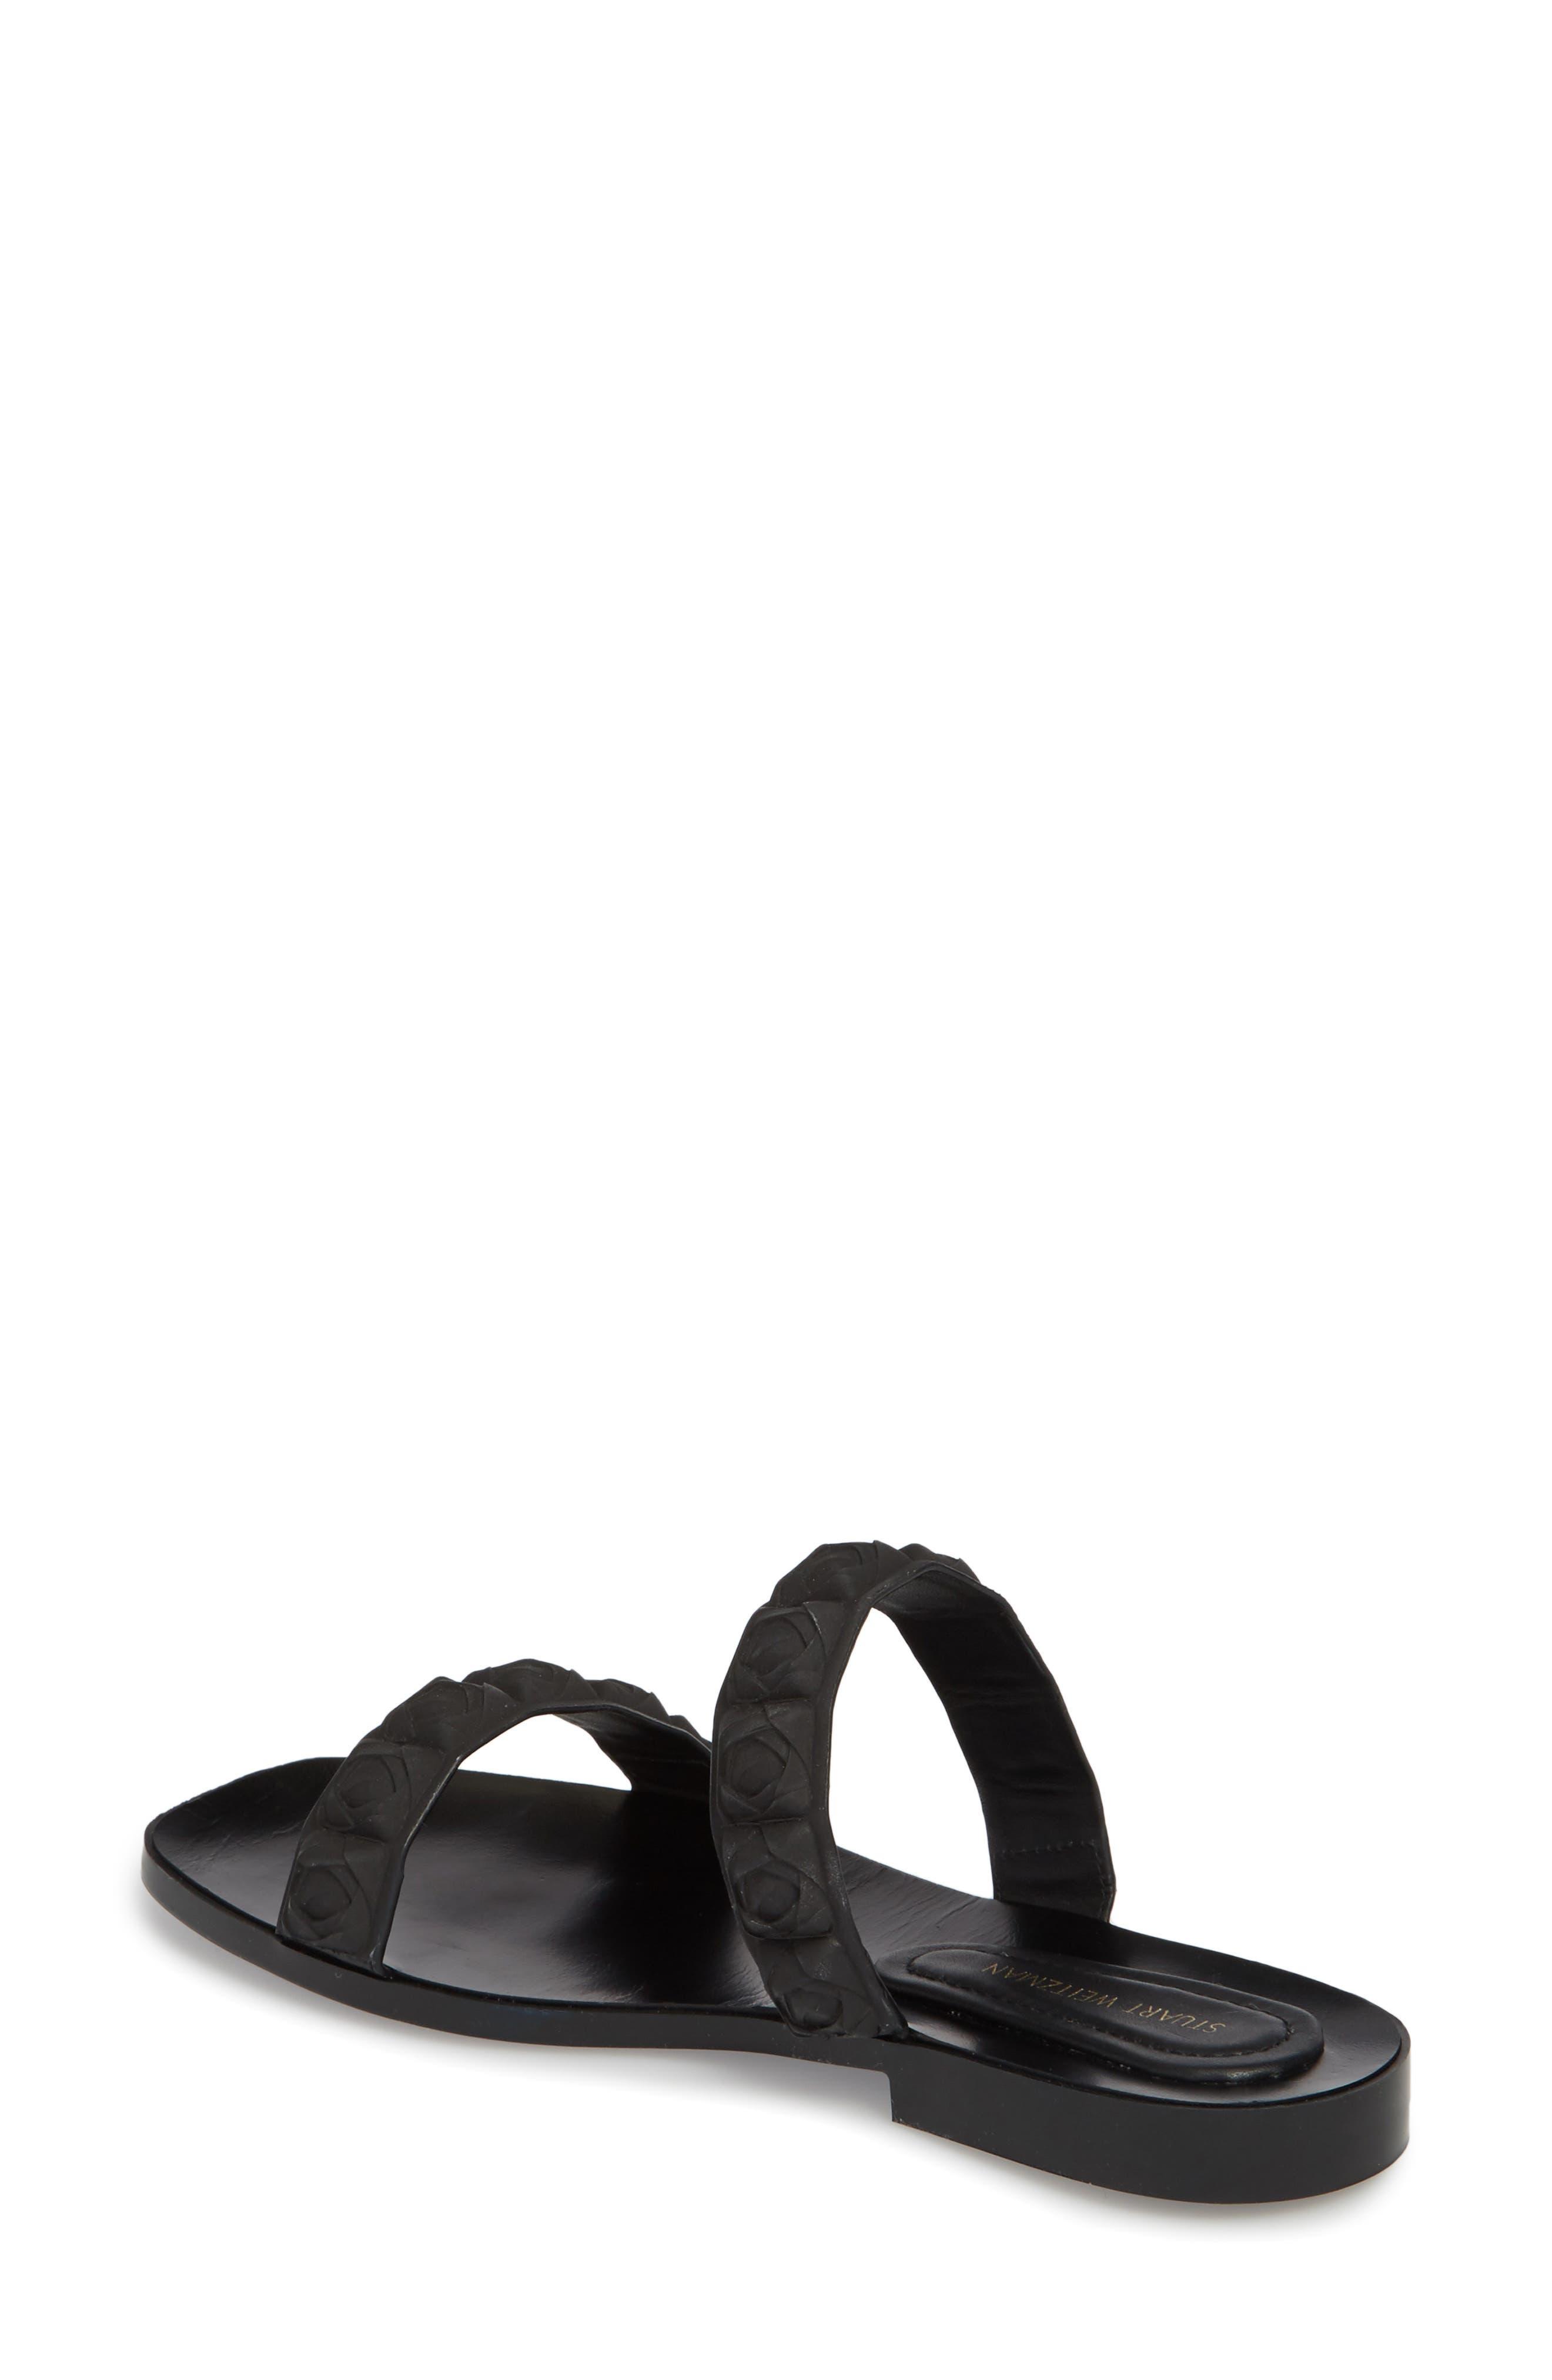 Rosita Dual Strap Slide Sandal,                             Alternate thumbnail 2, color,                             003